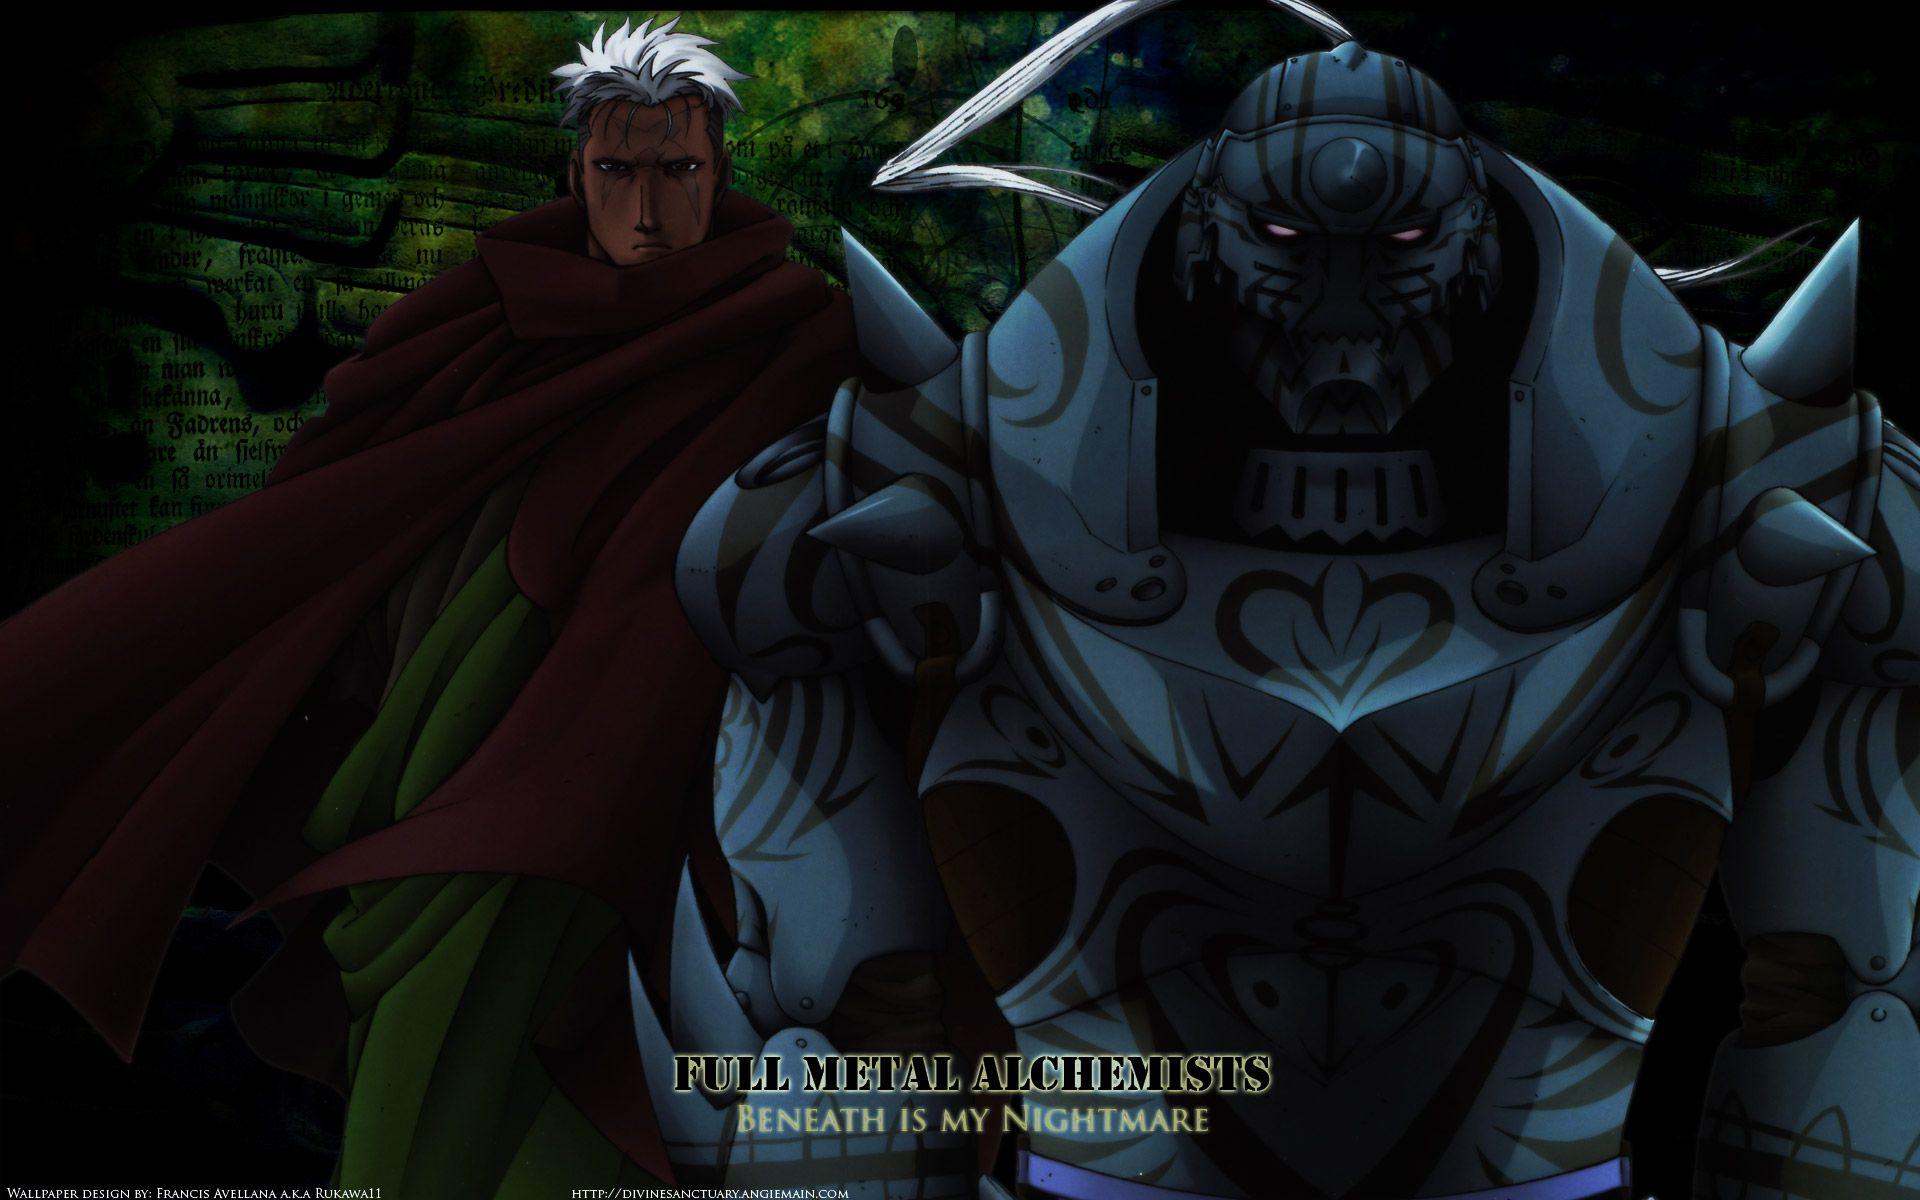 Alphonse Elric From FullMetal Alchemist Wallpaper Anime 1024x768 Wallpapers 40